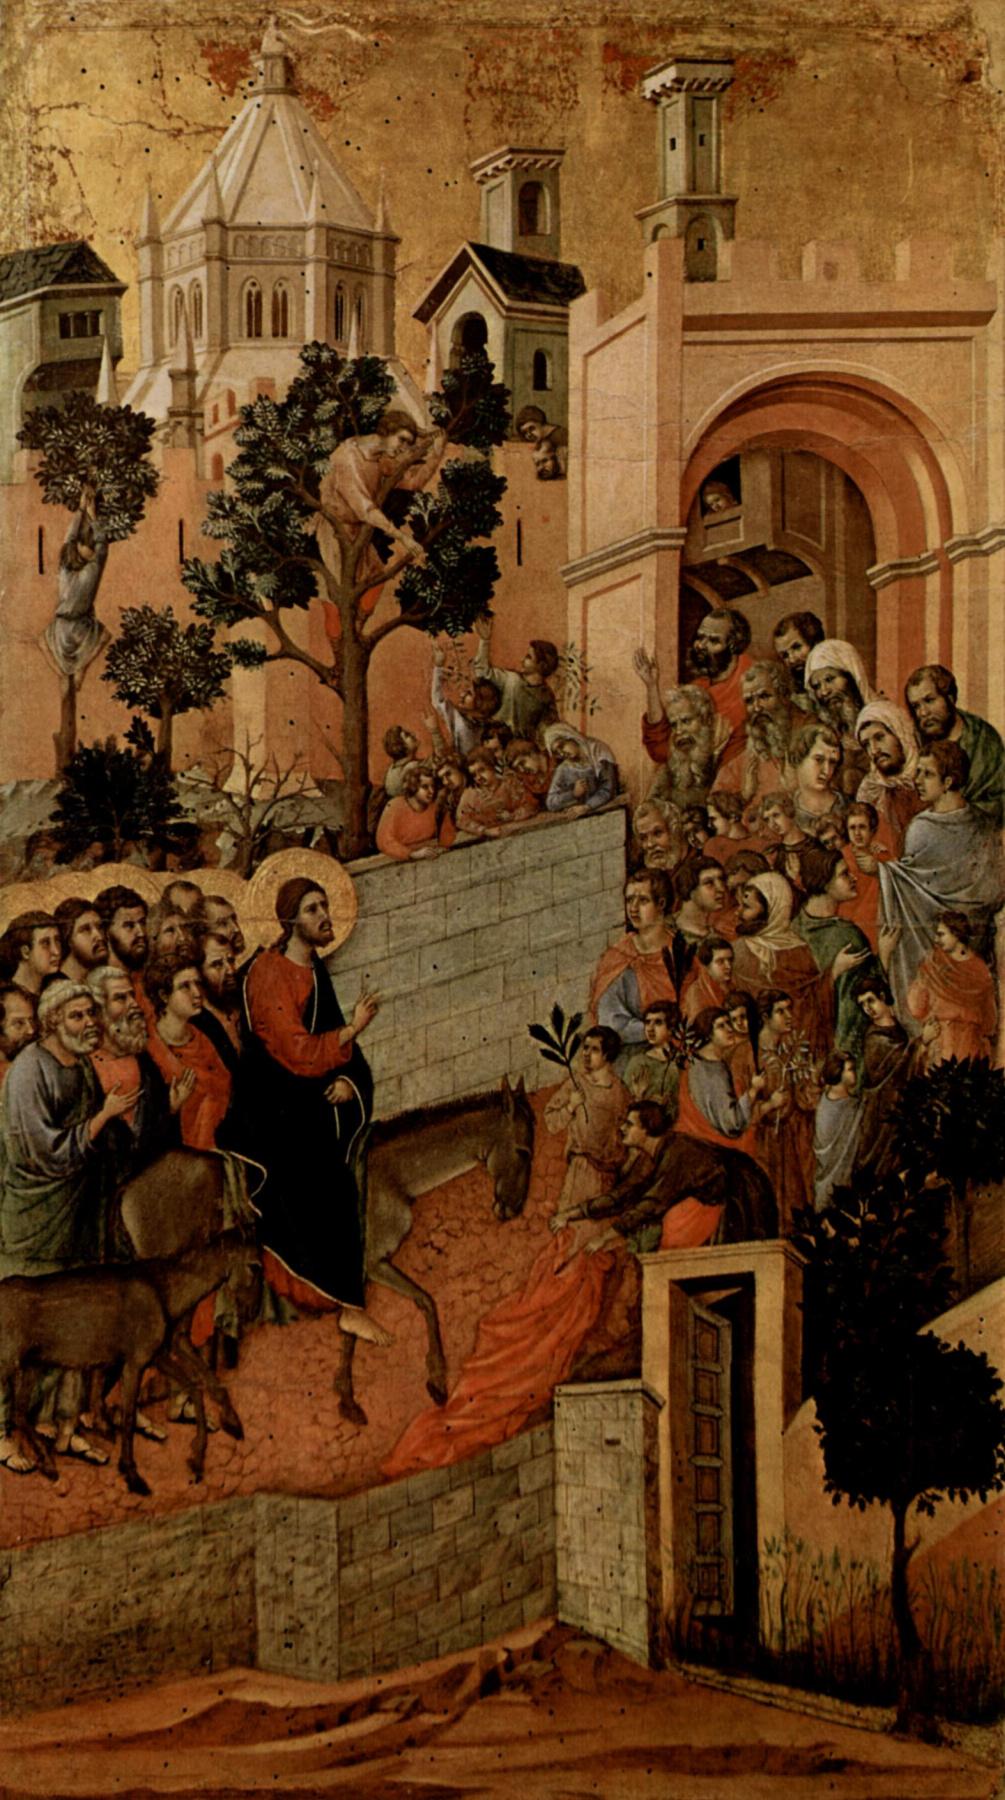 Duccio di Buoninsegna. Maesta, altar of Siena Cathedral, reverse side, Register with scenes of Christ's Passion, Christ's Entry into Jerusa